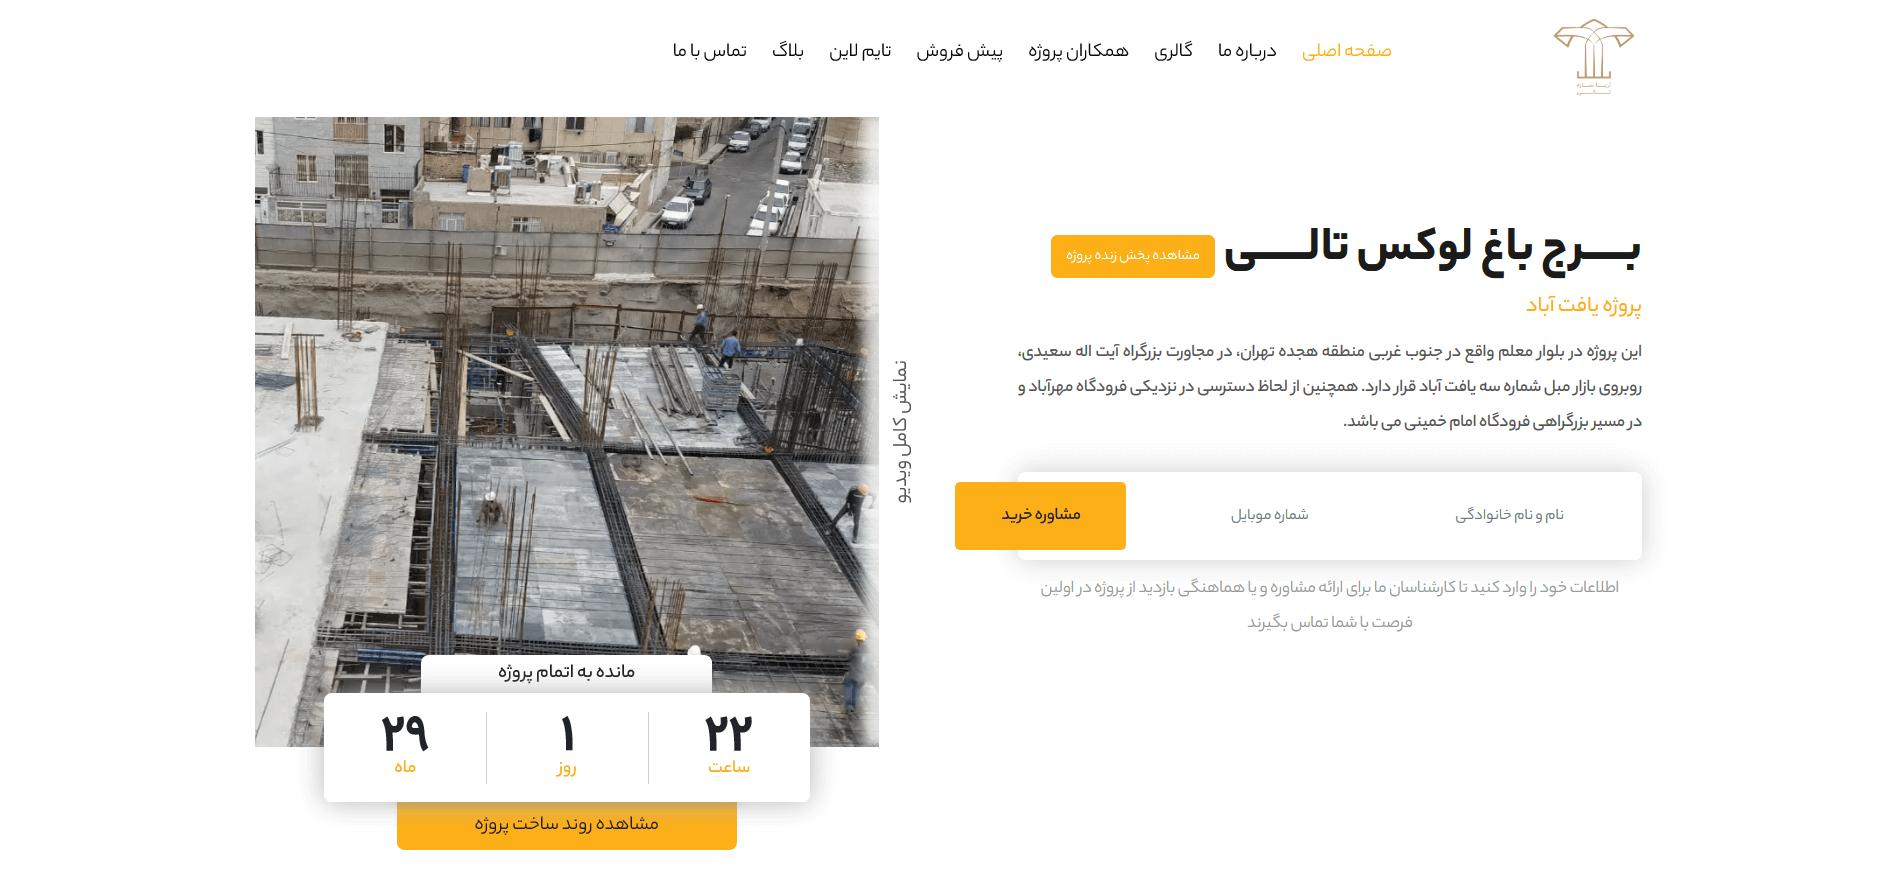 Screenshot_2020-04-24-پروژه-برج-باغ-تالی-برج-باغ-تالی،-اولین-مجتمع-مسکونی-با-واحدهای-کوچک-متراژ-و-خدمات-هتلینگ1